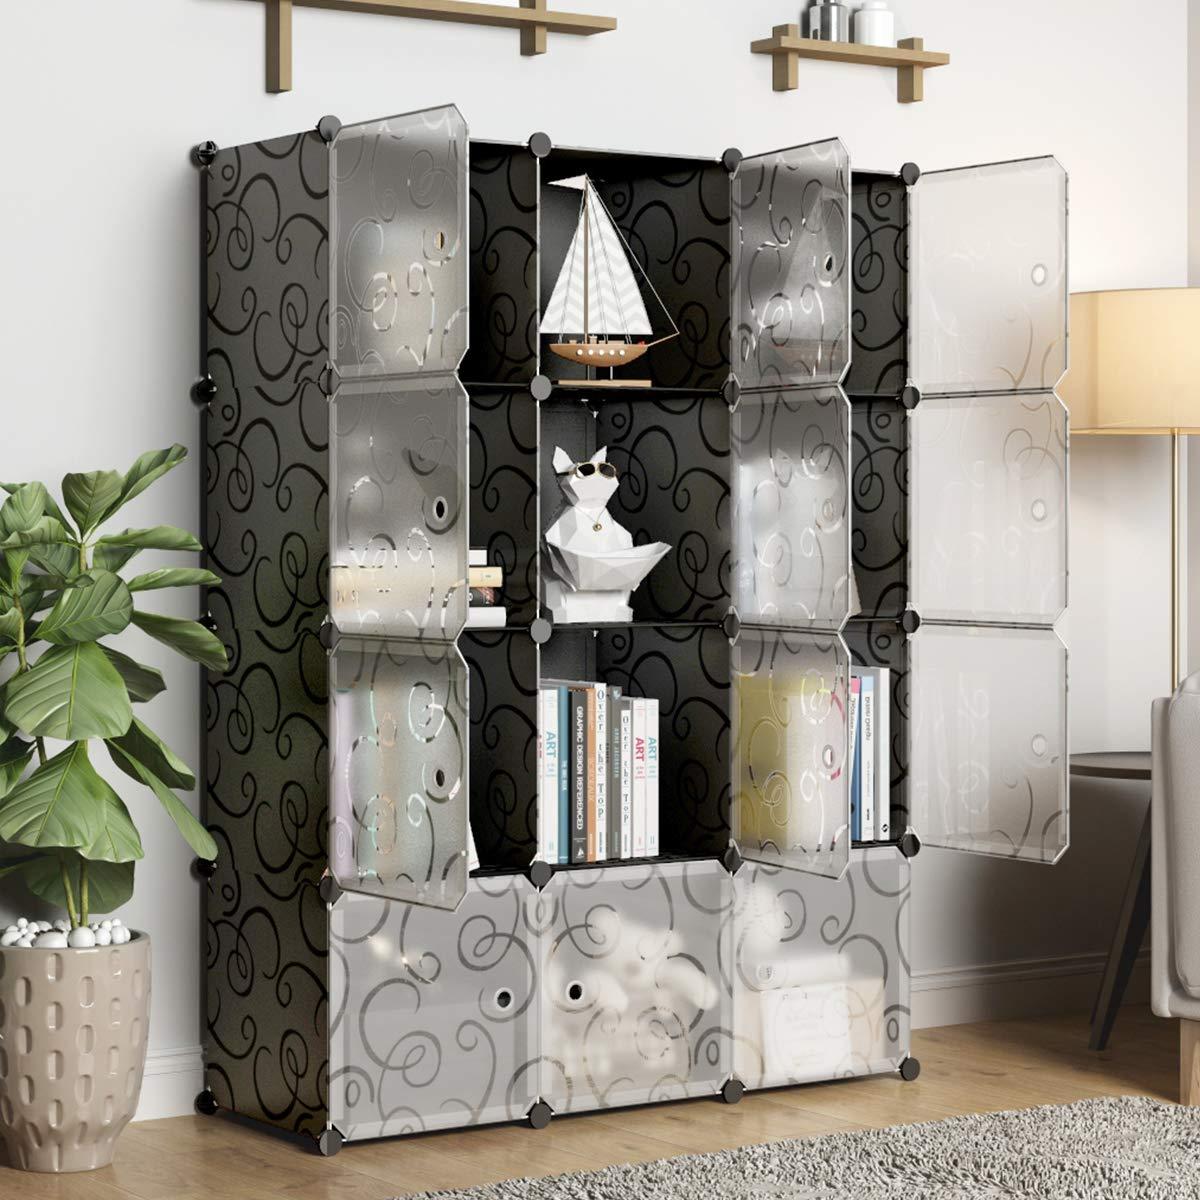 KOUSI Portable Storage Cubbies Storage Shelves Storage Organizer Shelf for Clothes Portable Shelf Toy Organizer Cabinet Plastic Dresser Clothes Storage Storage Cubes, Black, 12 Cubes by KOUSI (Image #3)